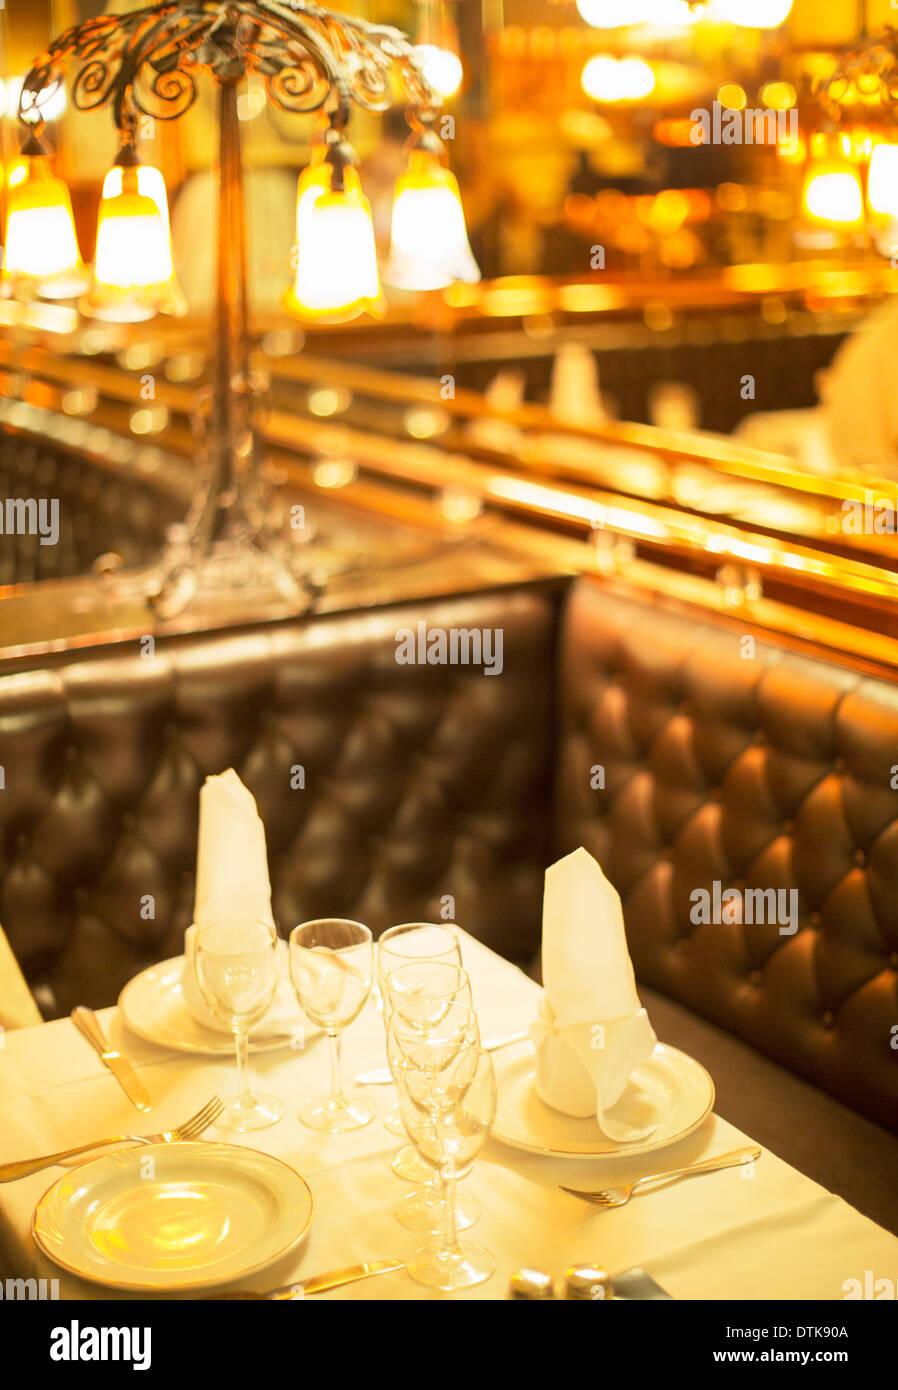 Set table in restaurant Photo Stock